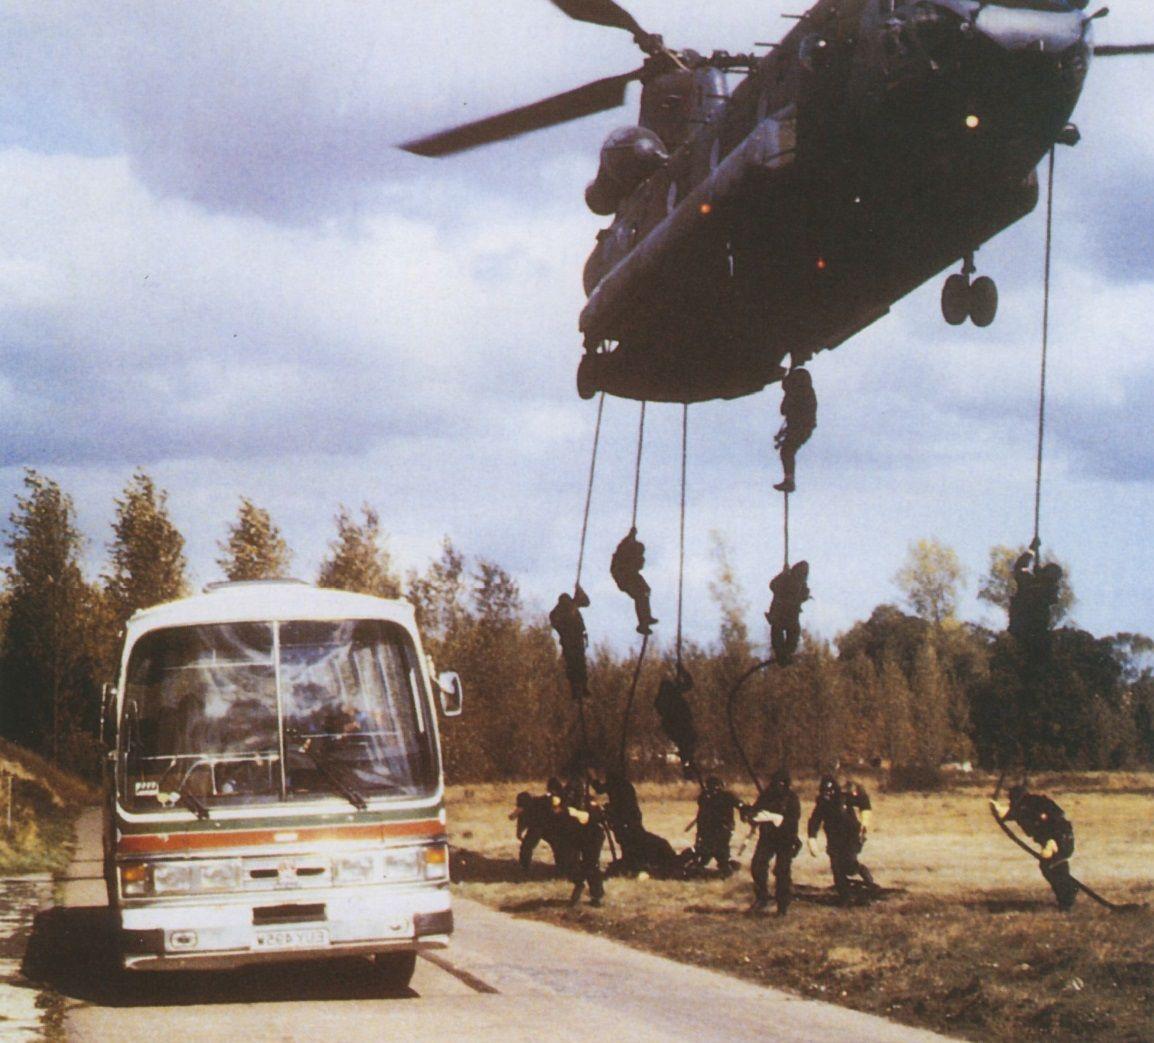 British SAS Bus takedown training, 1980s Military